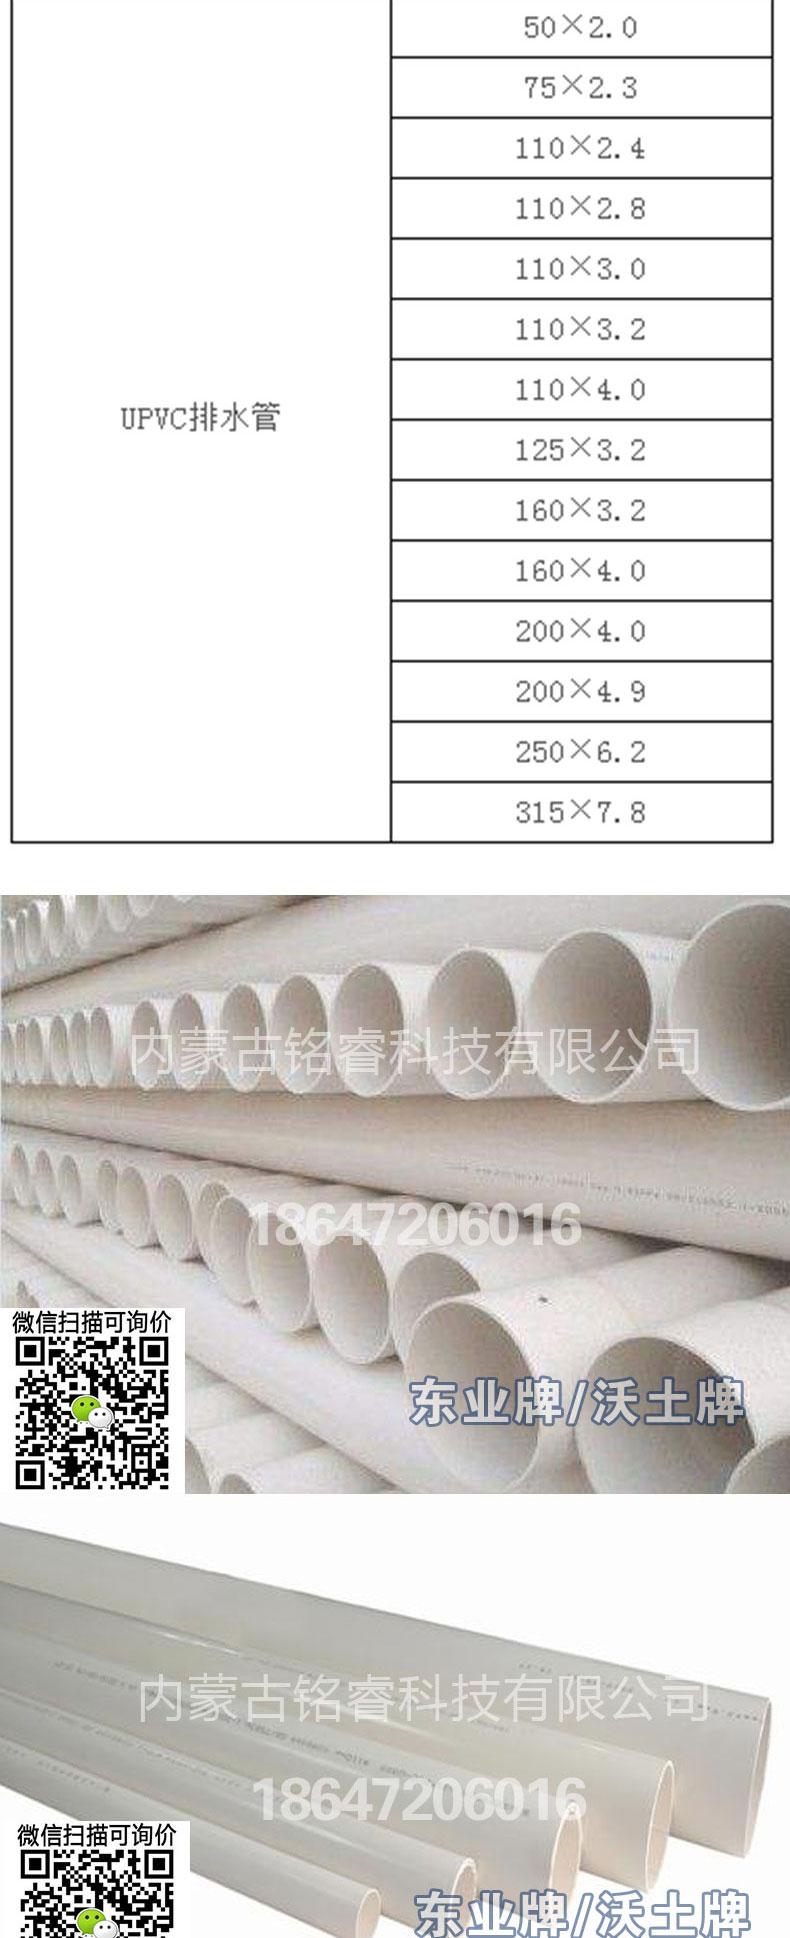 PVC-U排水管详情页_03.jpg